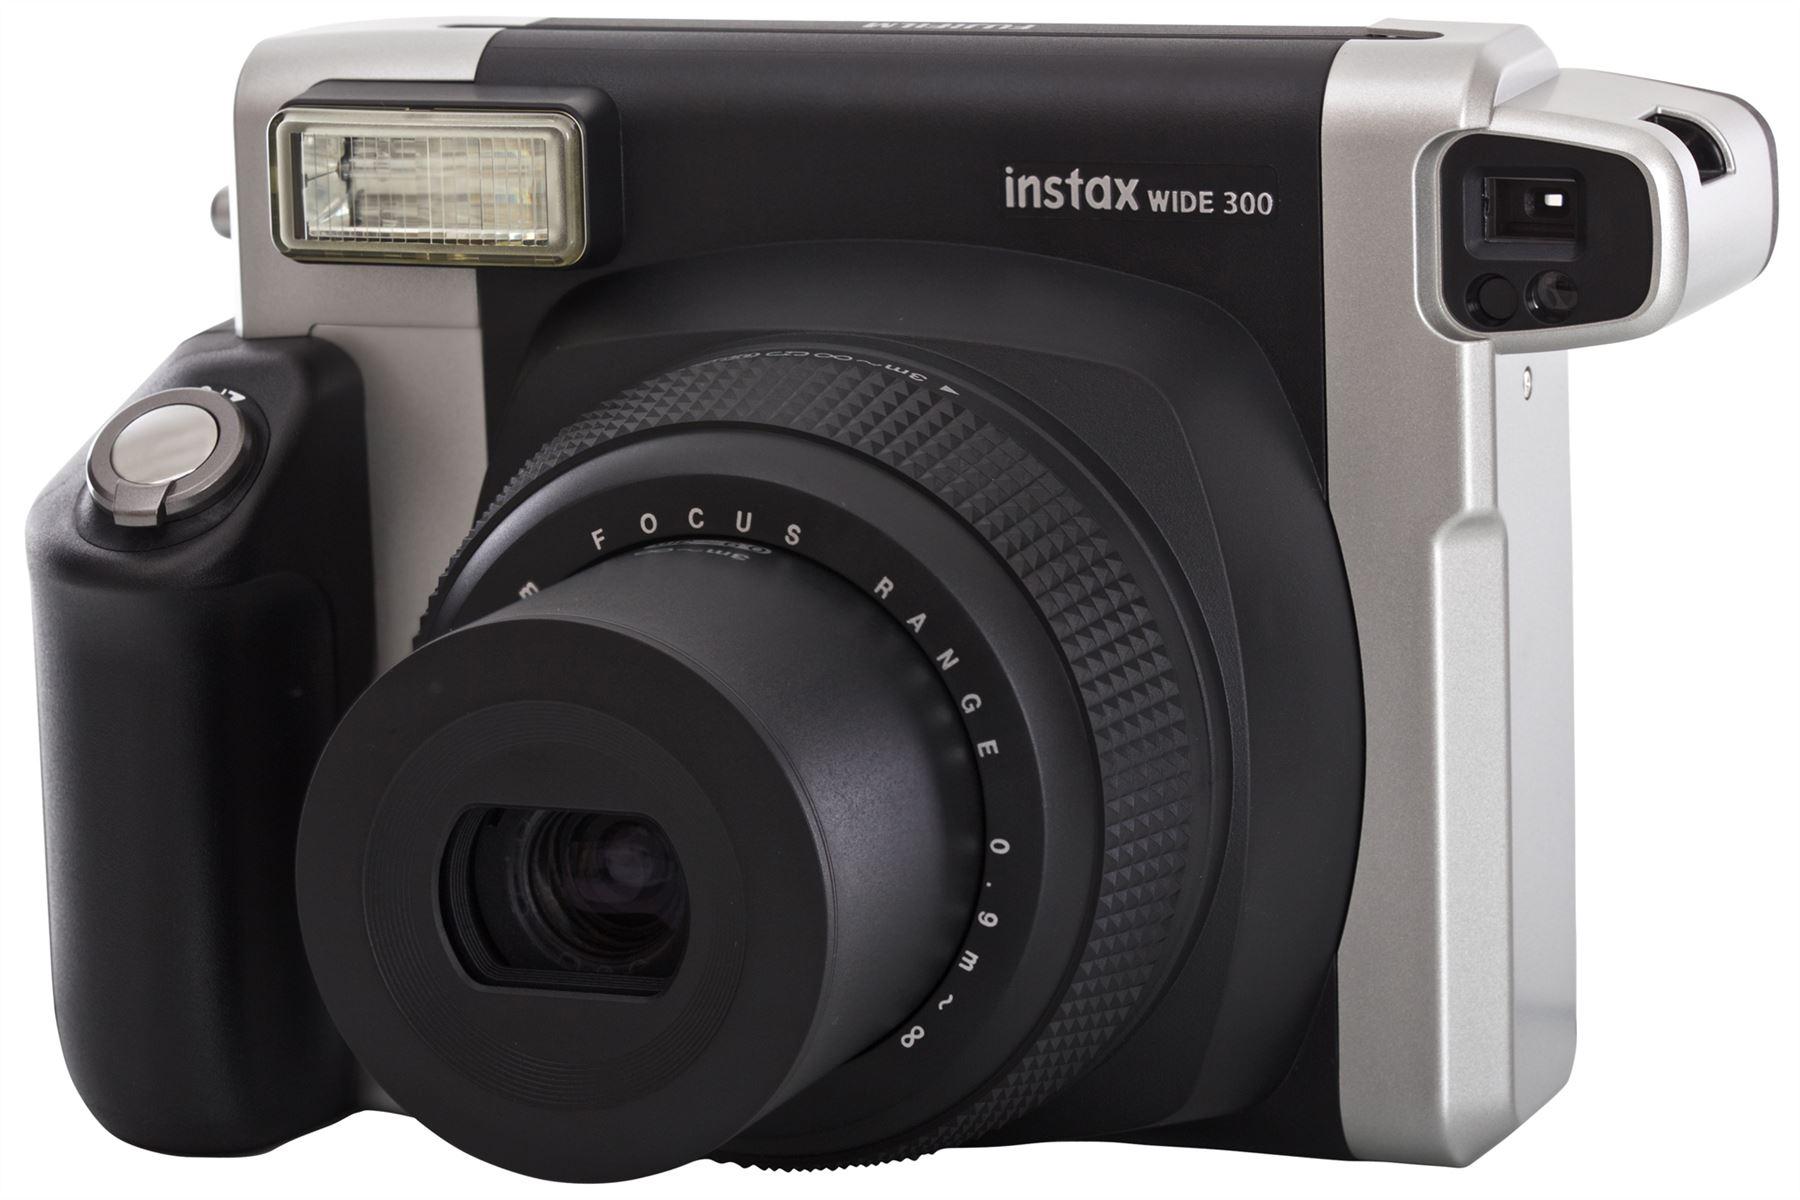 fujifilm fuji instax 300 wide picture format camera 10 shots film ebay. Black Bedroom Furniture Sets. Home Design Ideas